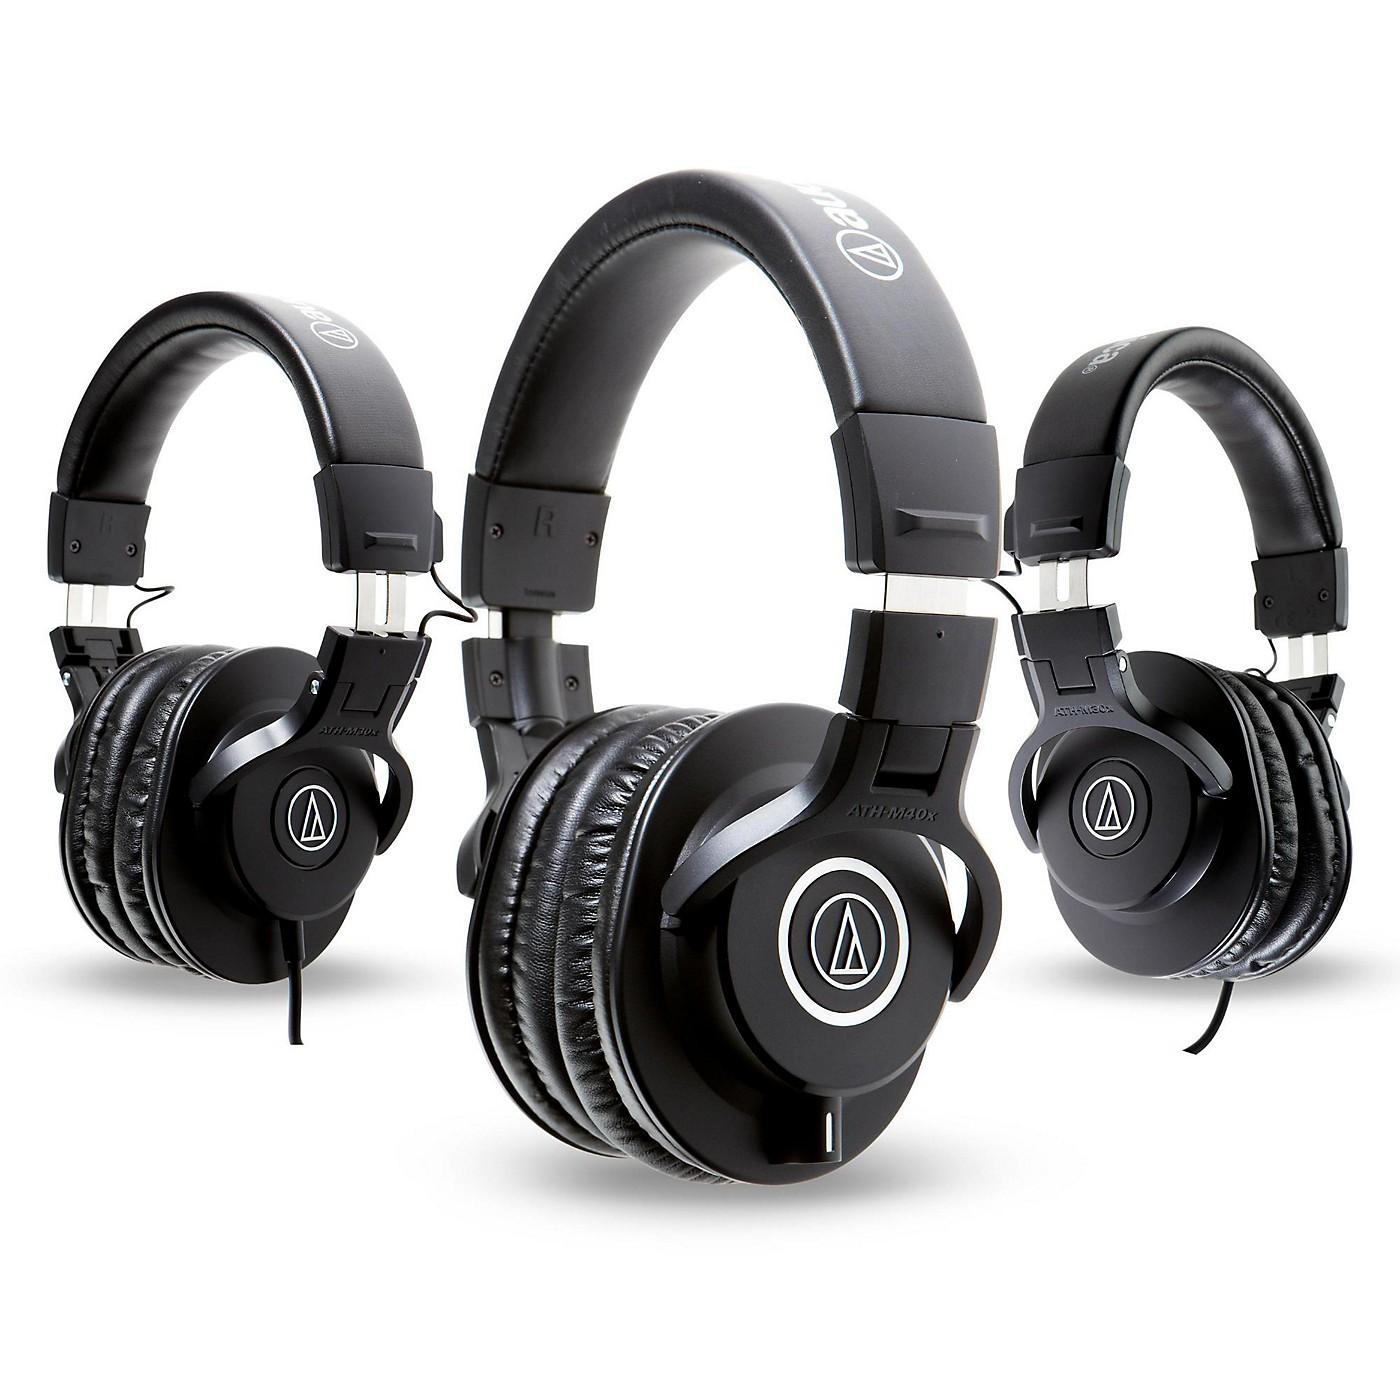 Audio-Technica ATH-M40x Headphones with 2 ATH-M30x Headphones thumbnail